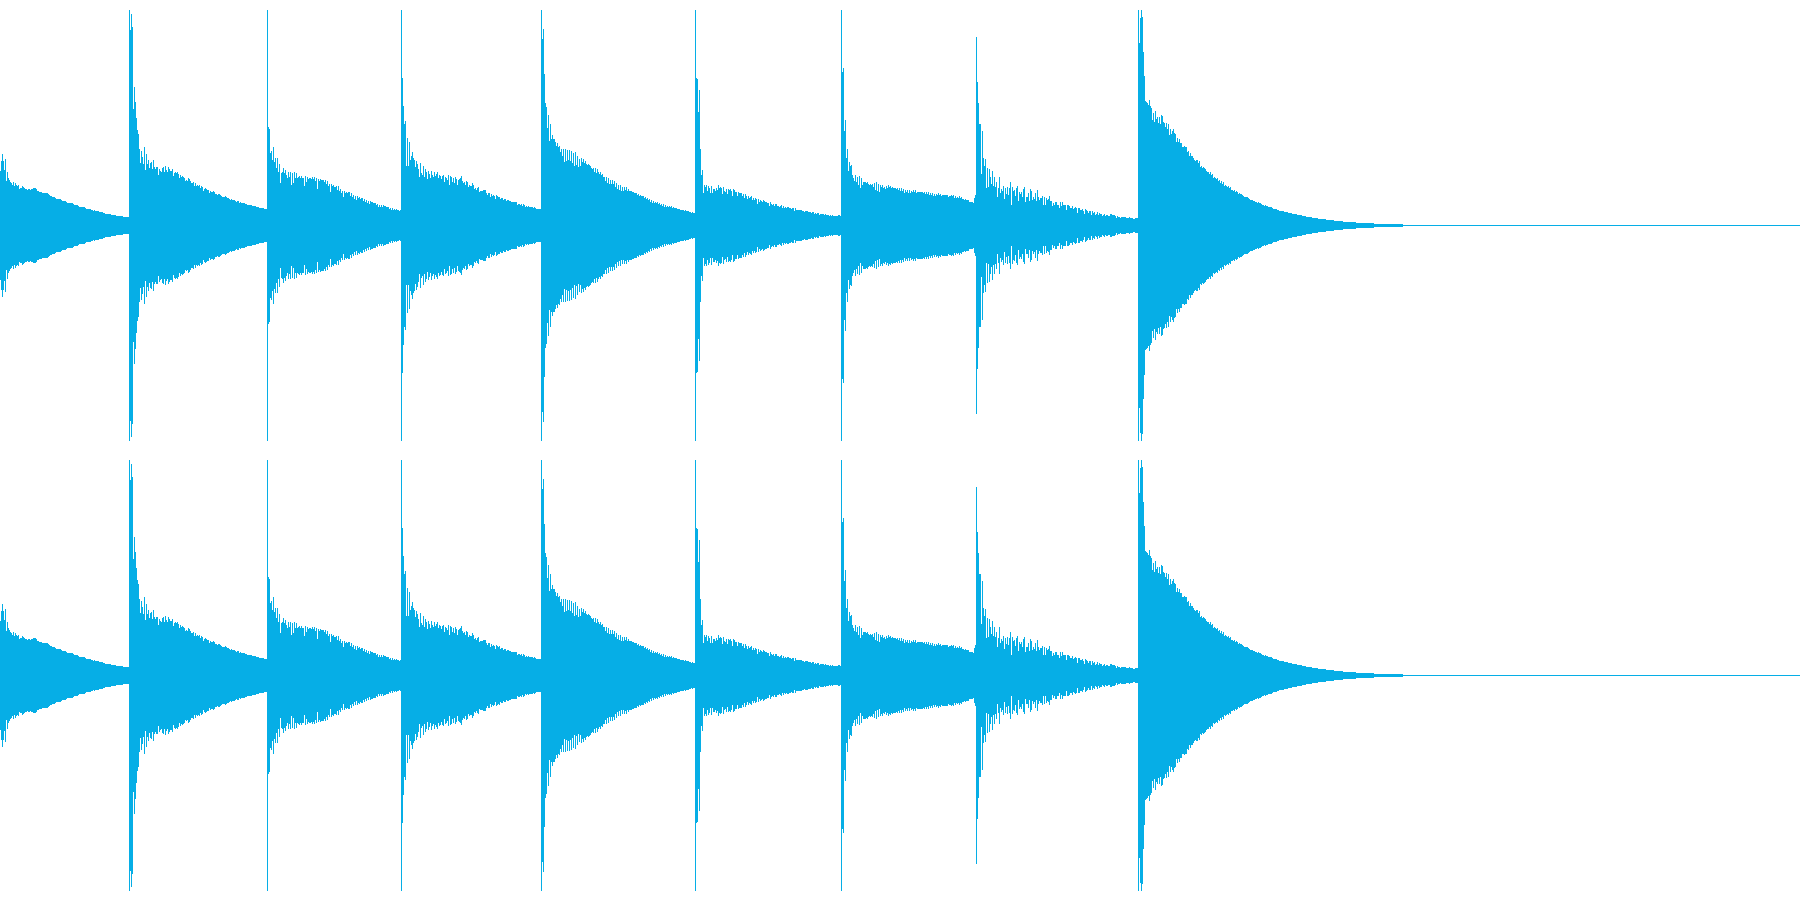 【SE 効果音】不気味なメロディの再生済みの波形